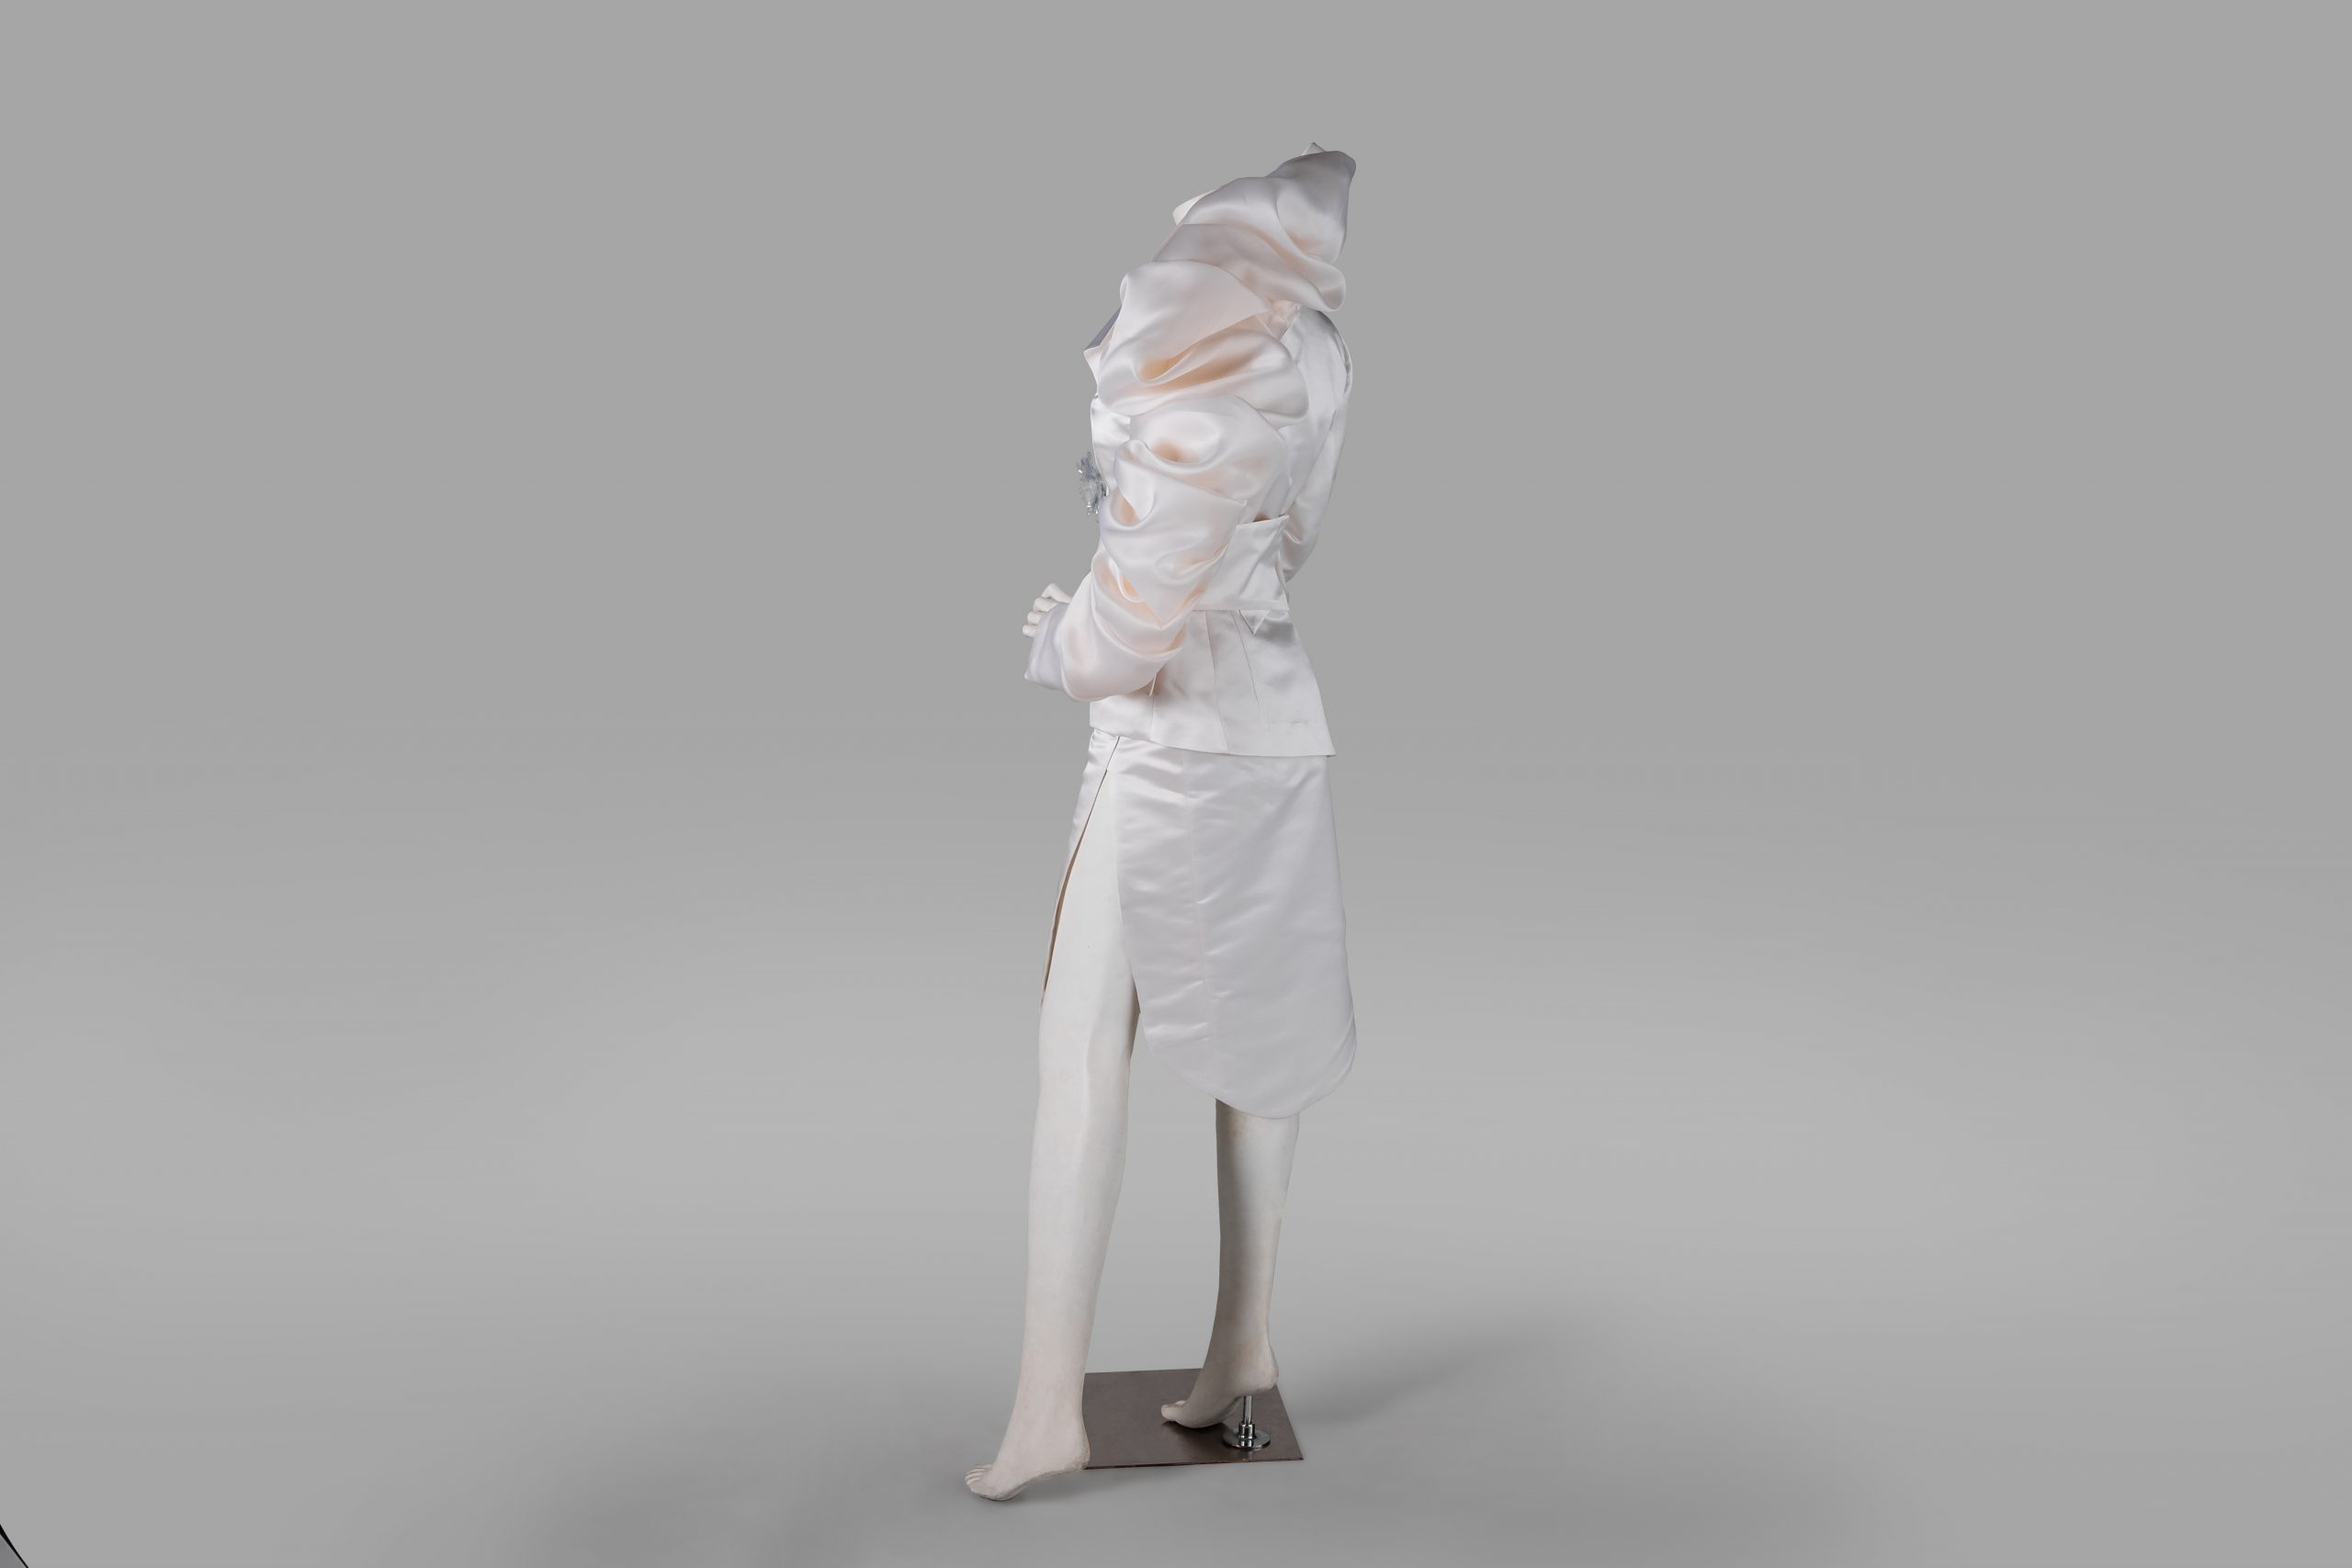 the beginning of female independence white dress tilting left